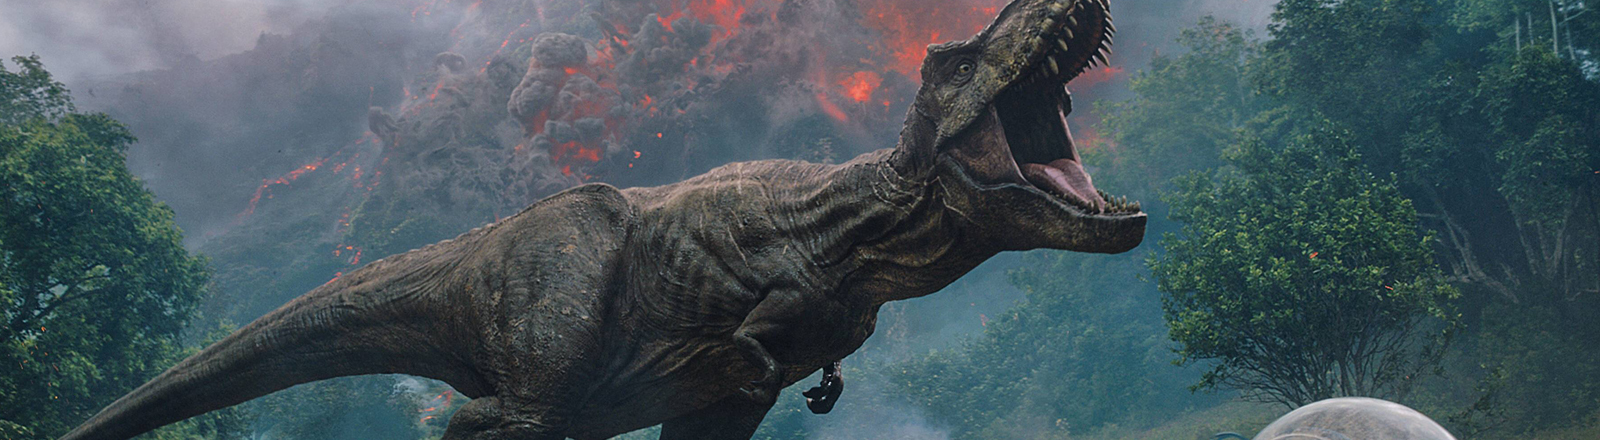 Szene aus Jurassic World 2